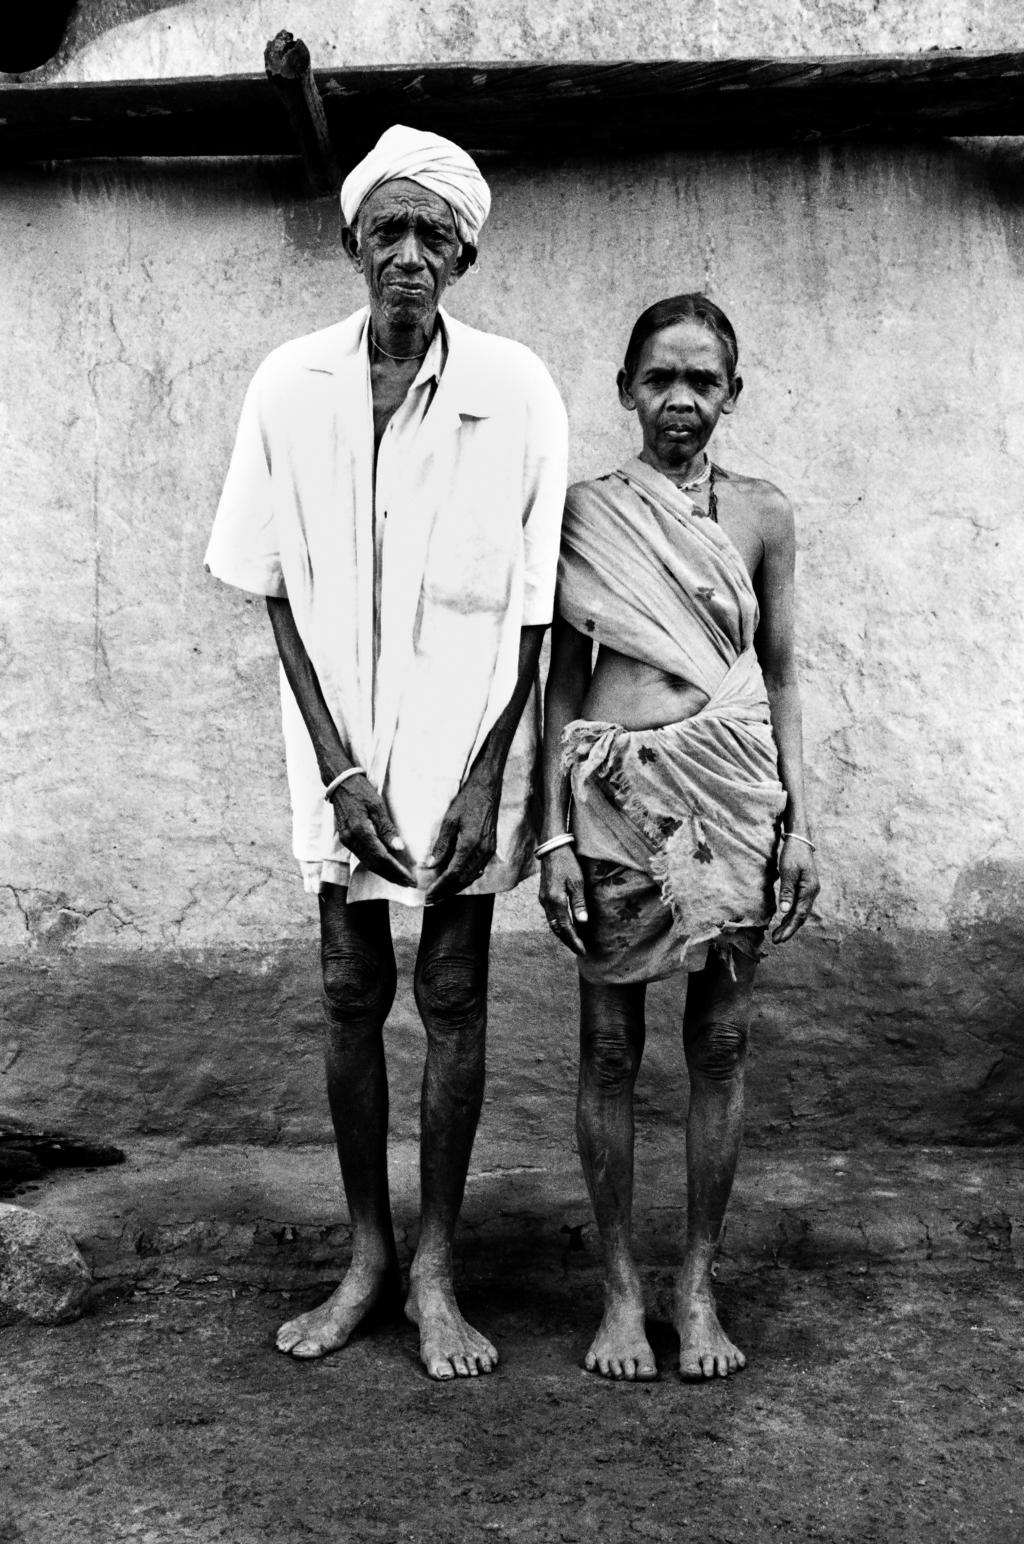 Giungla indiana - Madhya Pradesh: Stefano Cardone Photographer Reportage